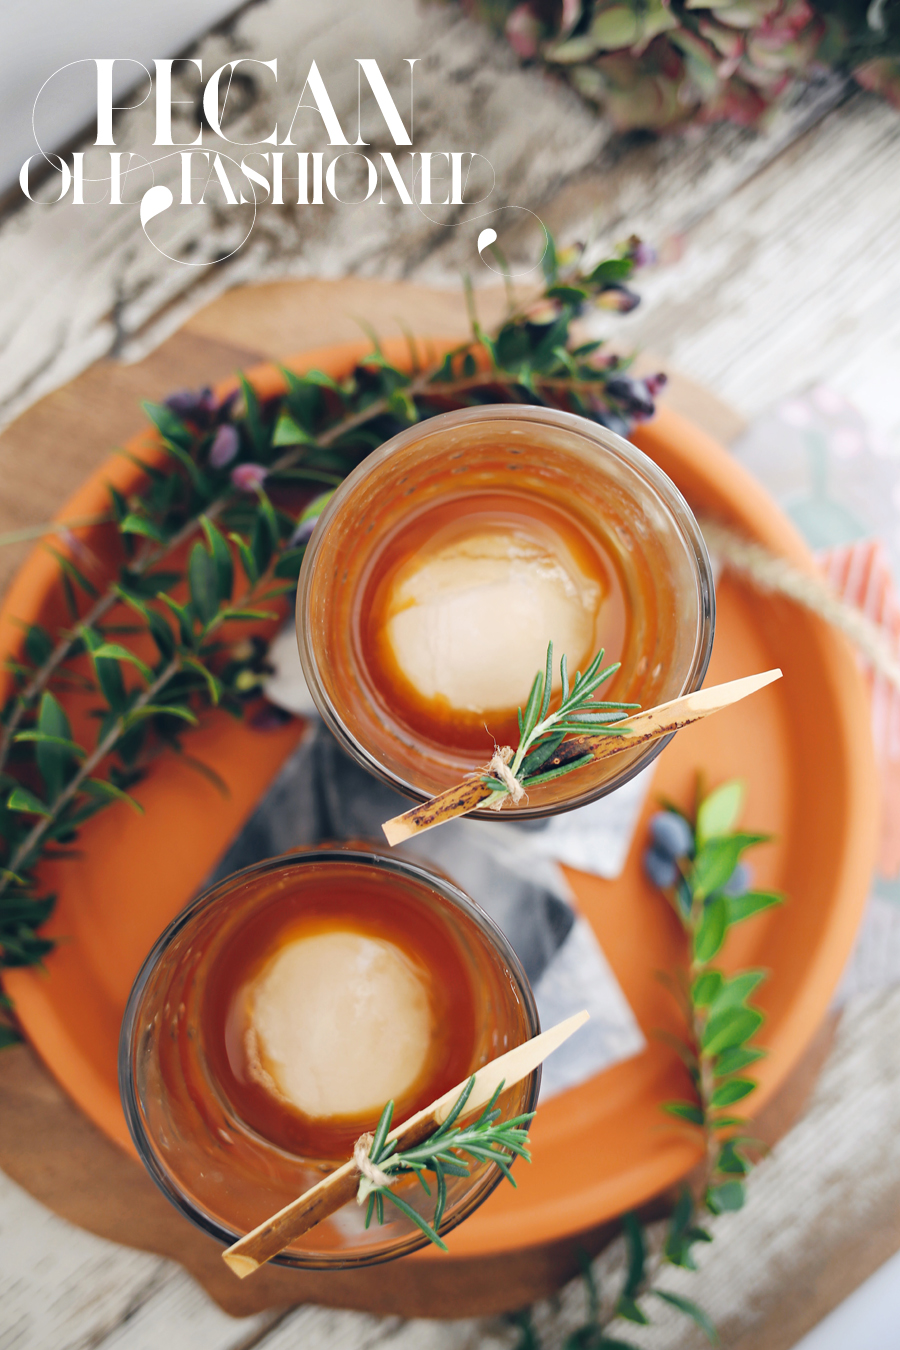 pecan-old-fashion-cocktail-dine-x-design